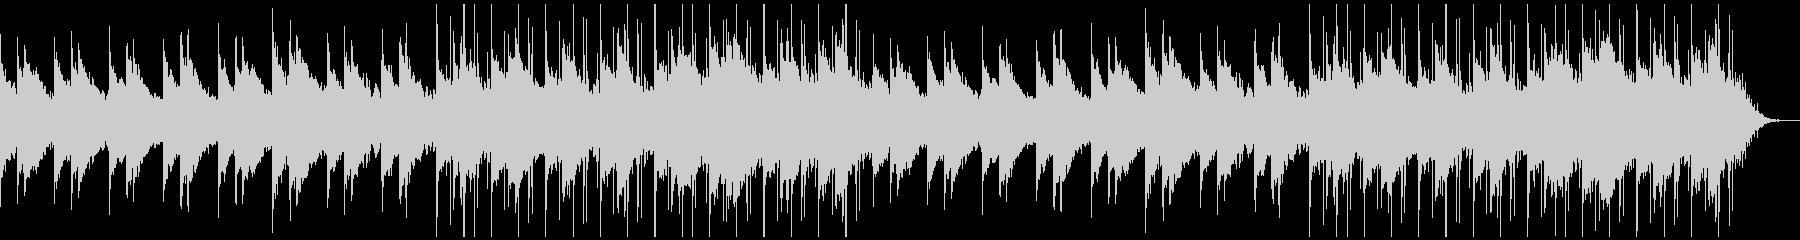 Piano Ambient 2の未再生の波形